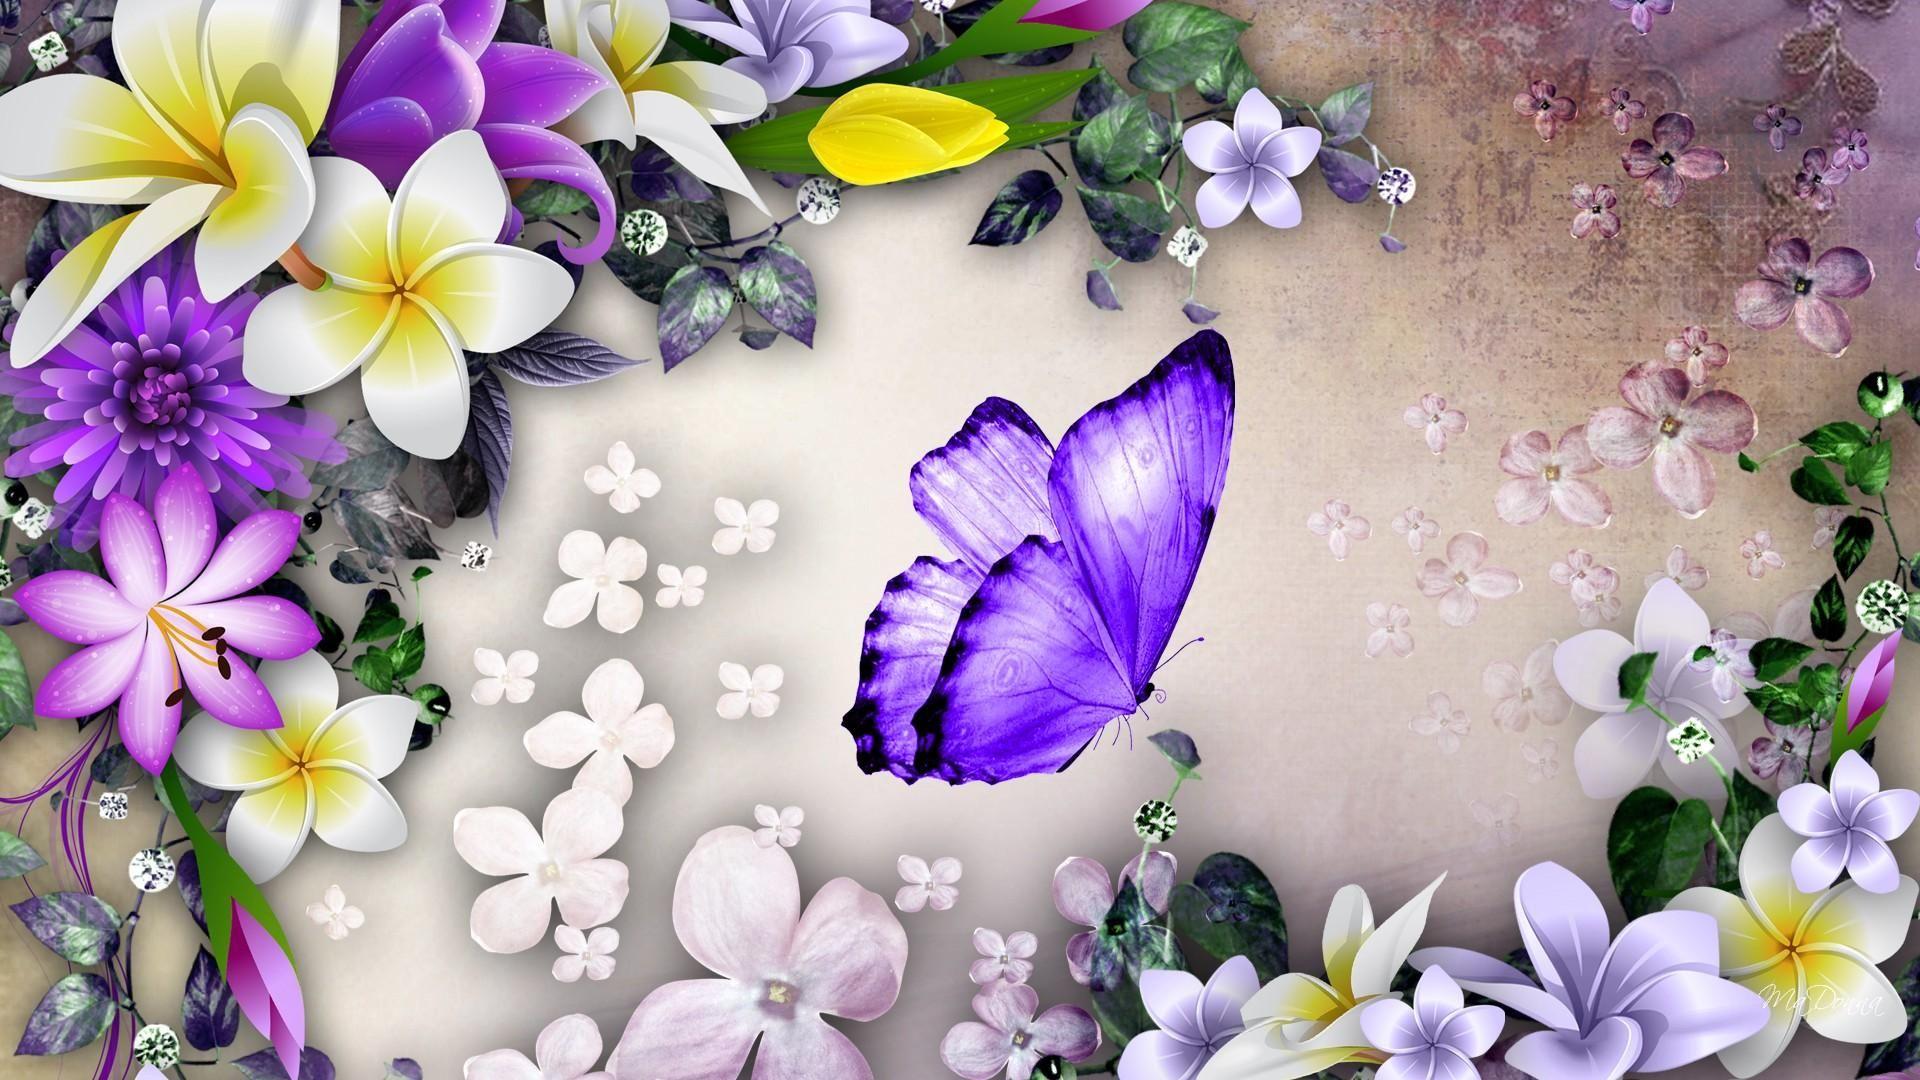 Best Wallpaper High Quality Purple - 209ced638d324628b4c2043c9331519c  Trends_607051.jpg